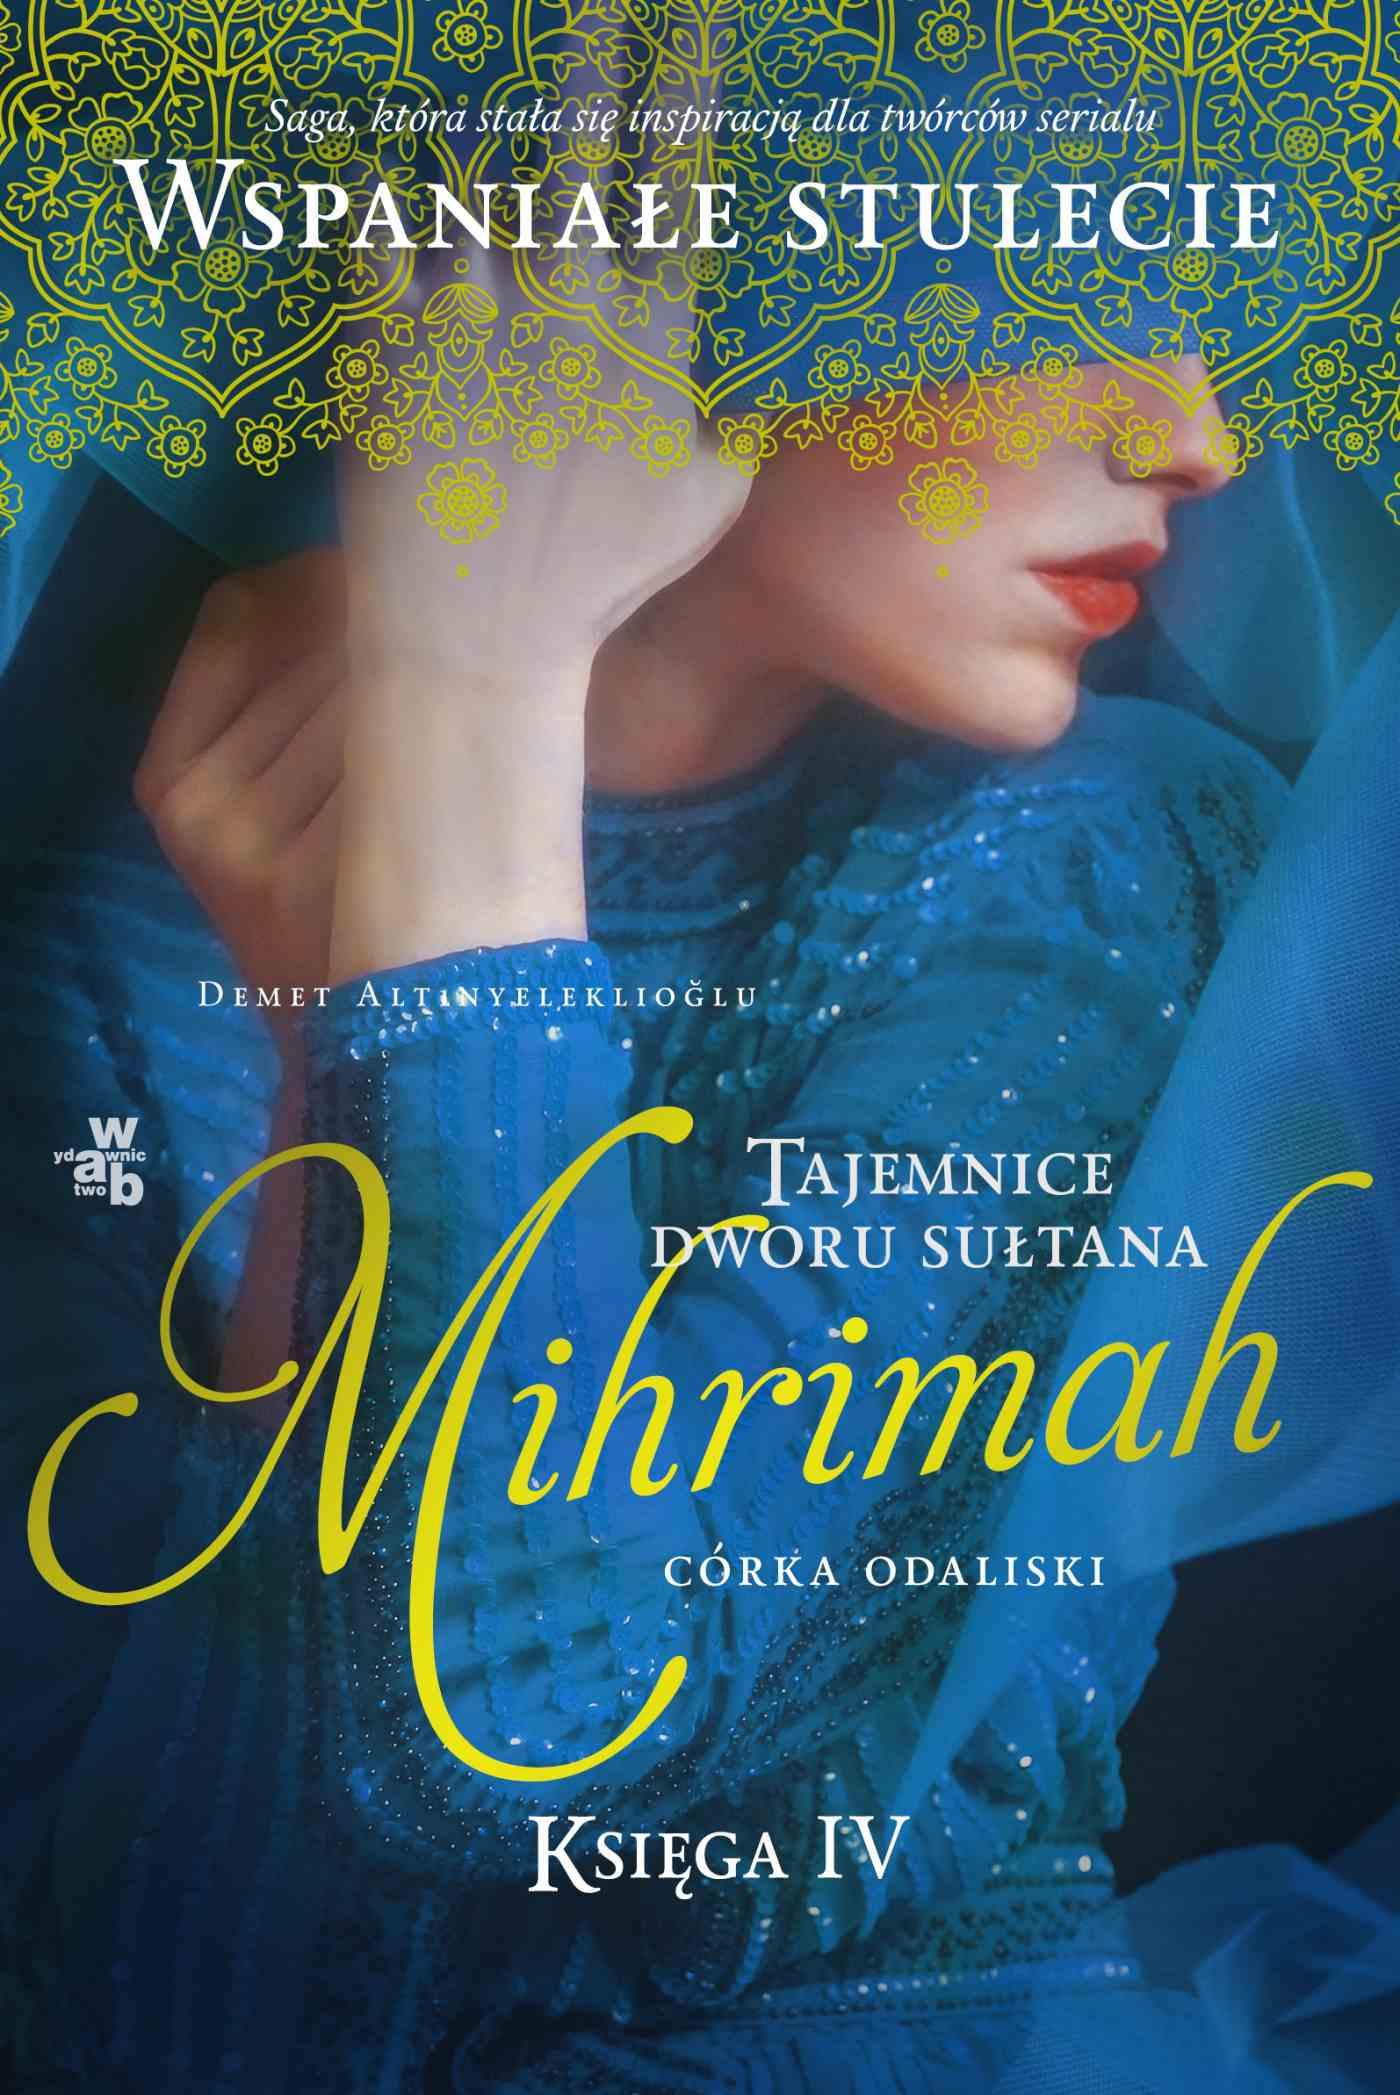 Tajemnice dworu sułtana. Mihrimah. Córka odaliski. Księga 4 - Ebook (Książka na Kindle) do pobrania w formacie MOBI